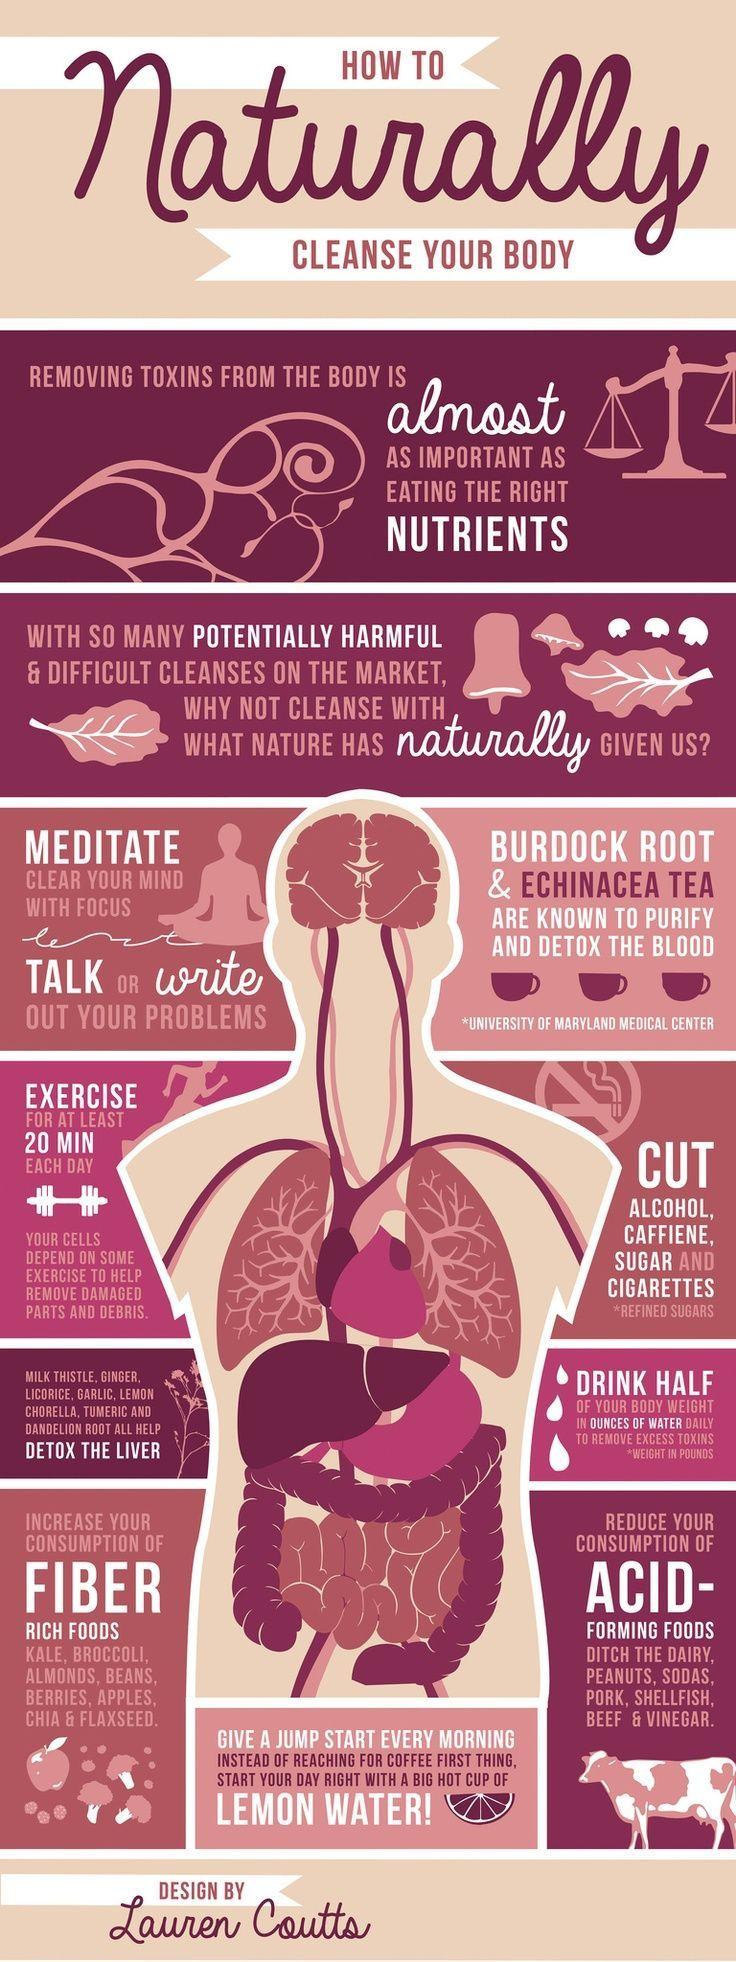 How to Naturally Cleanse Your Body. Someday I will cut the alcohol and caffeine ...repinned für Gewinner! - jetzt gratis Erfolgsratgeber sichern www.ratsucher.de